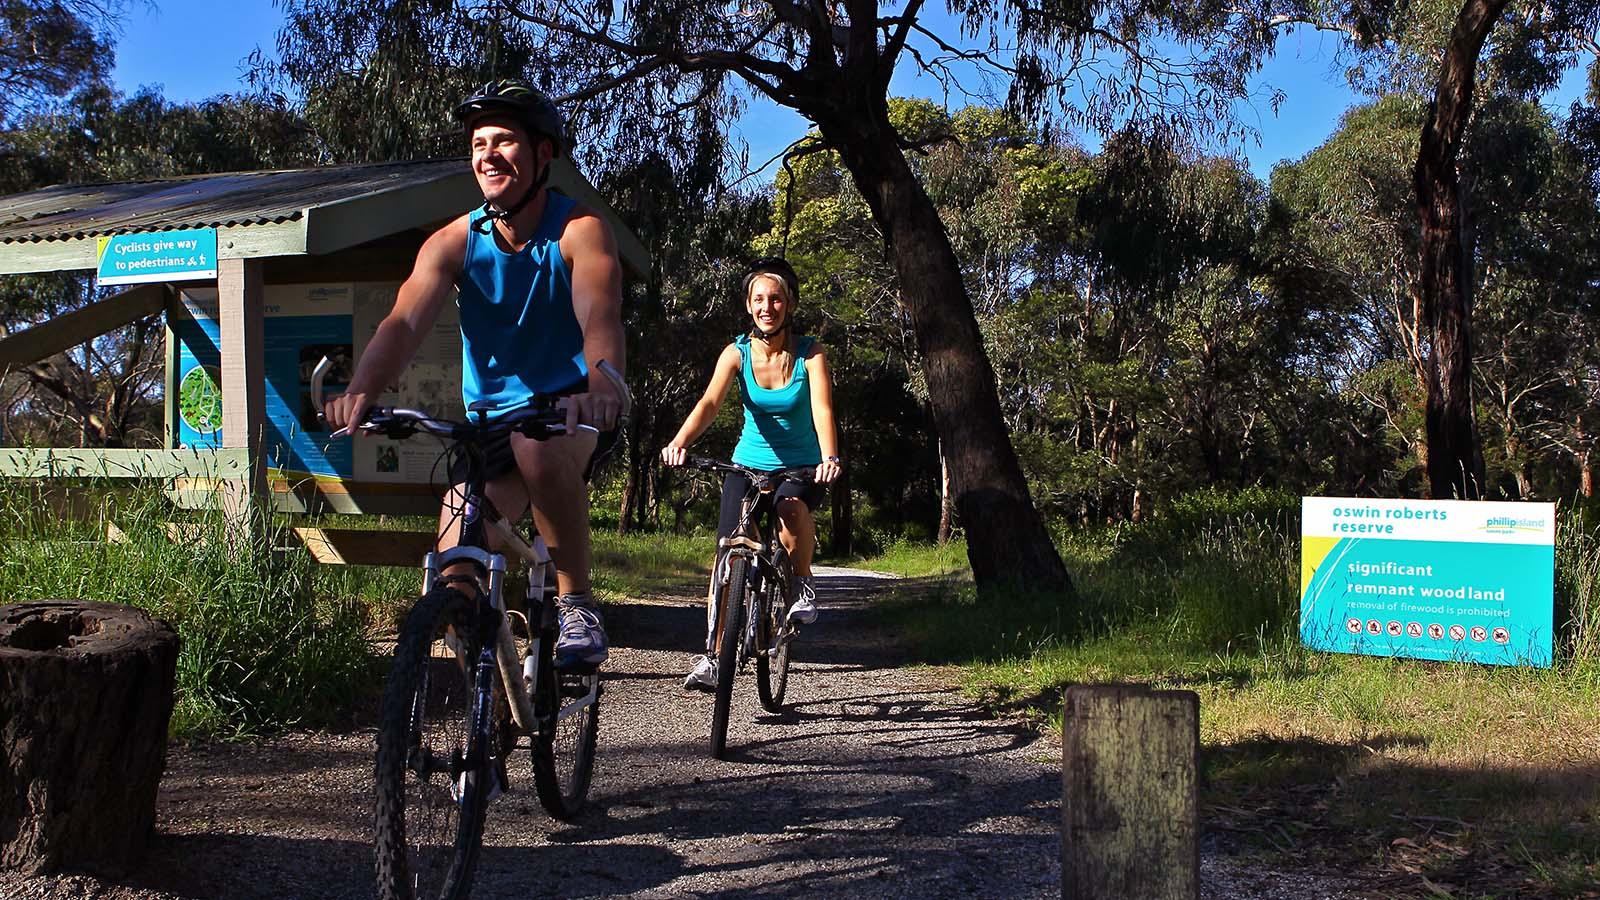 Oswin Roberts Reserve Cycling Trail, Phillip Island, Victoria, Australia